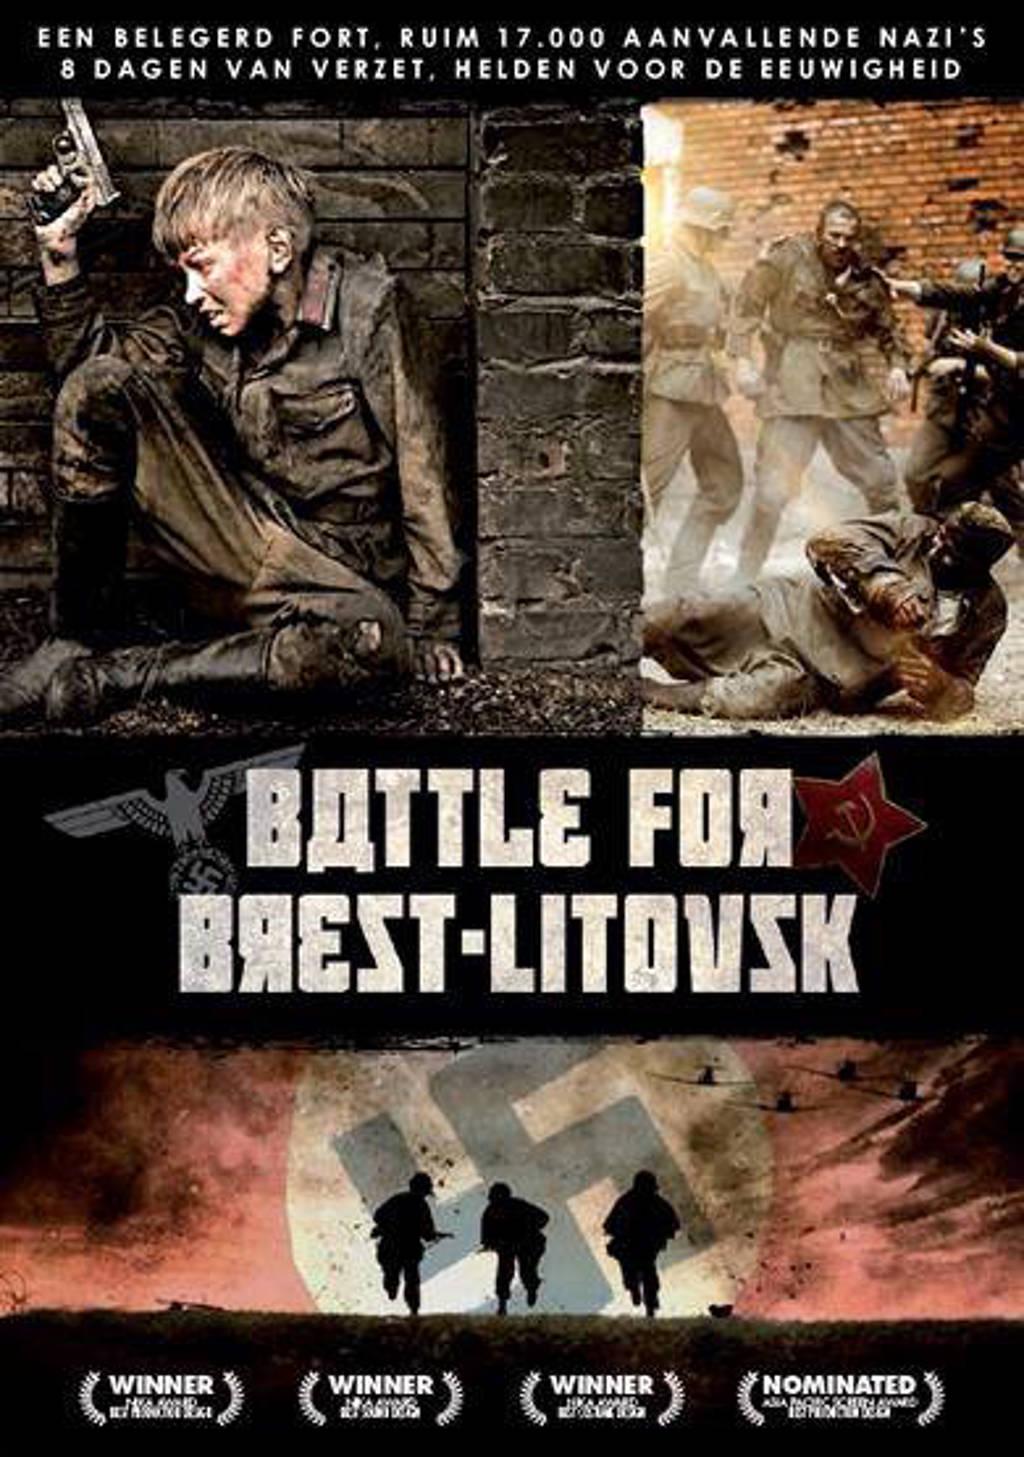 Battle for brest-litovsk (DVD)